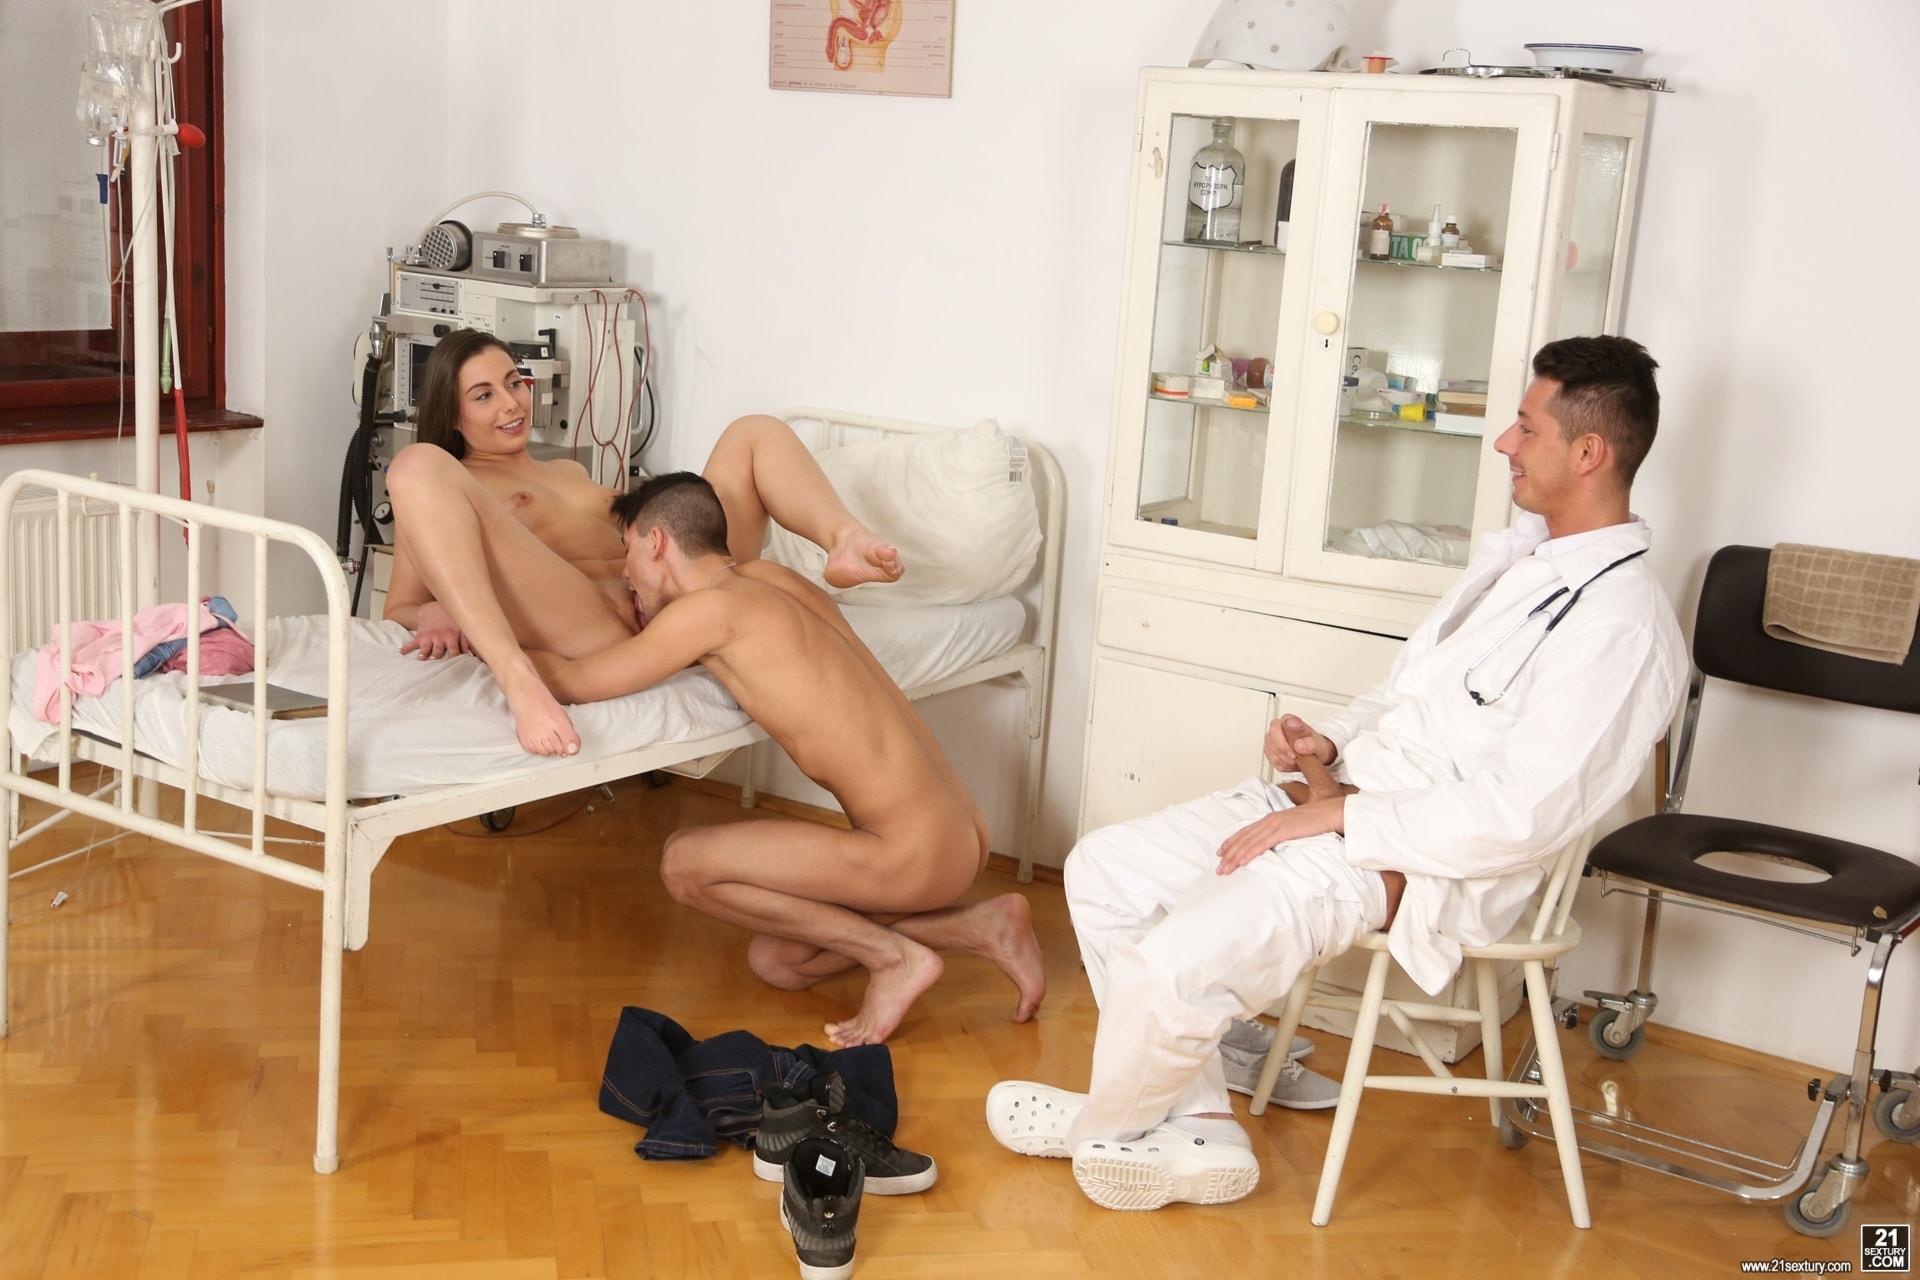 21Sextury 'Hospital Threesome' starring Carla Crouz (Photo 10)